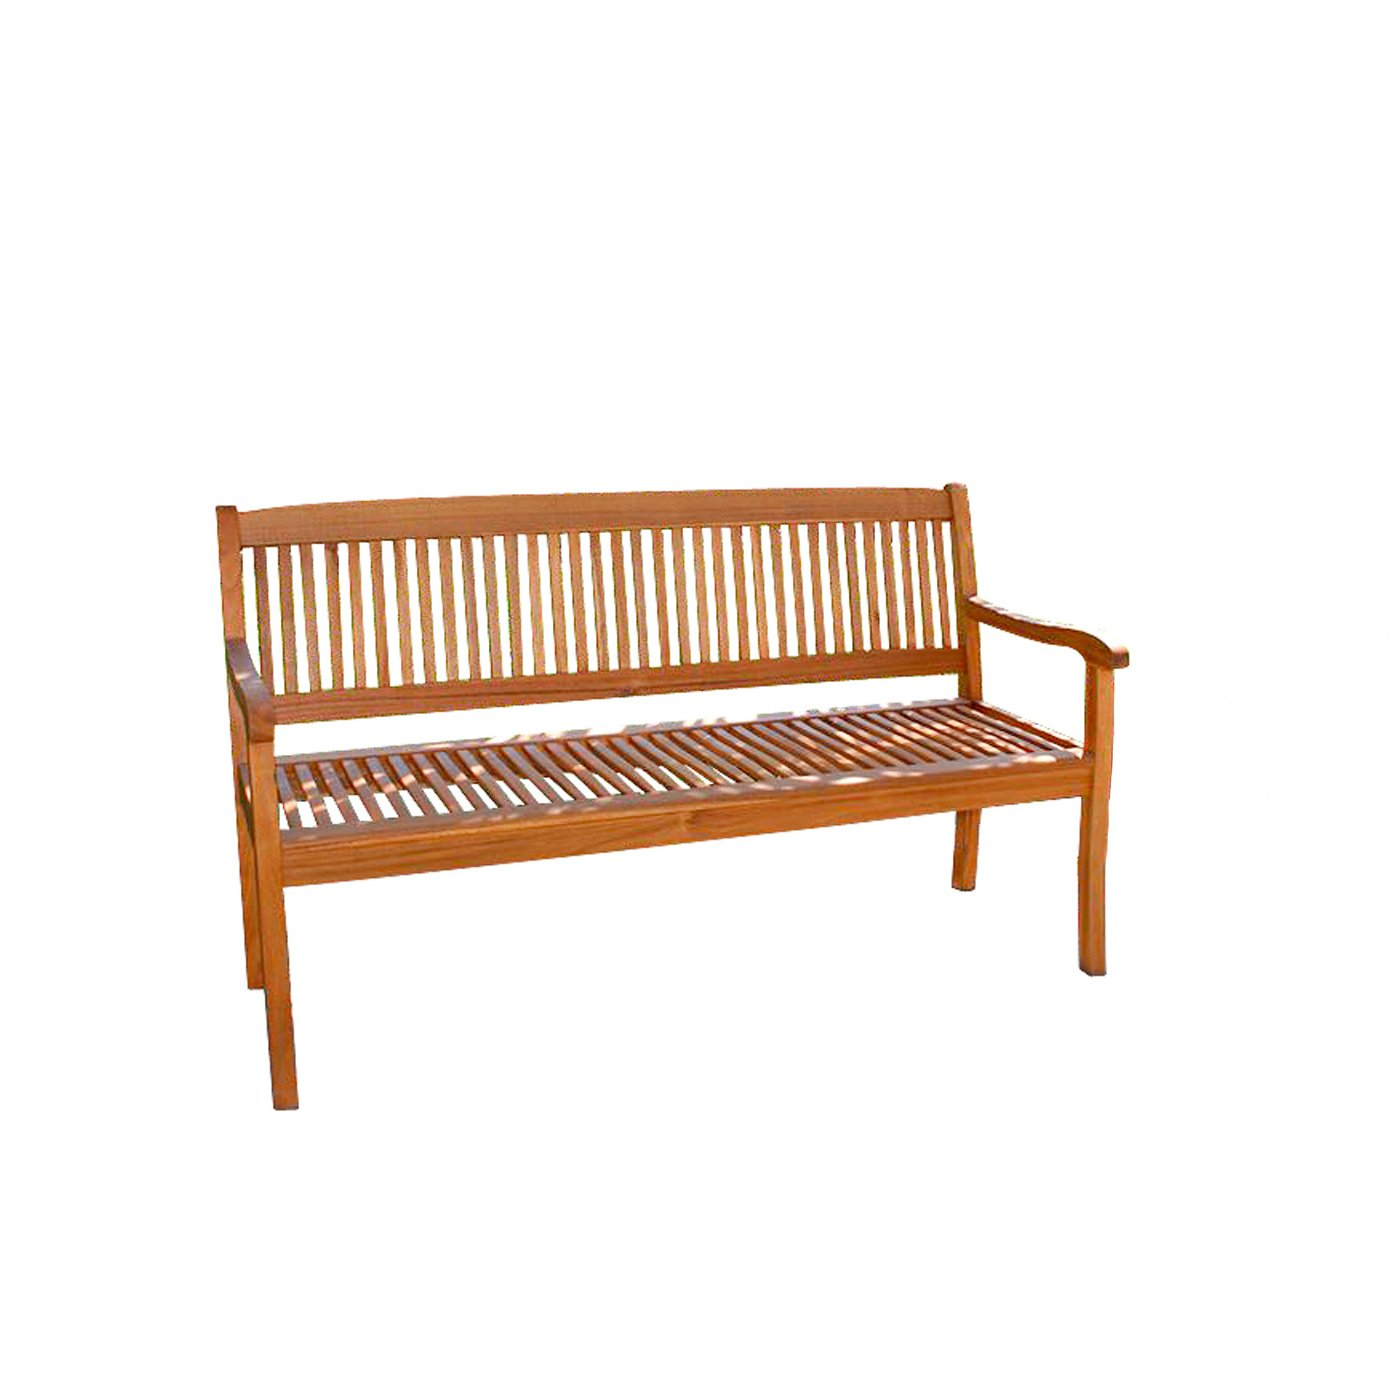 SAM Gartenbank, France, 3-Sitzer, akazie, 64 x 157 x 90 cm, 54010